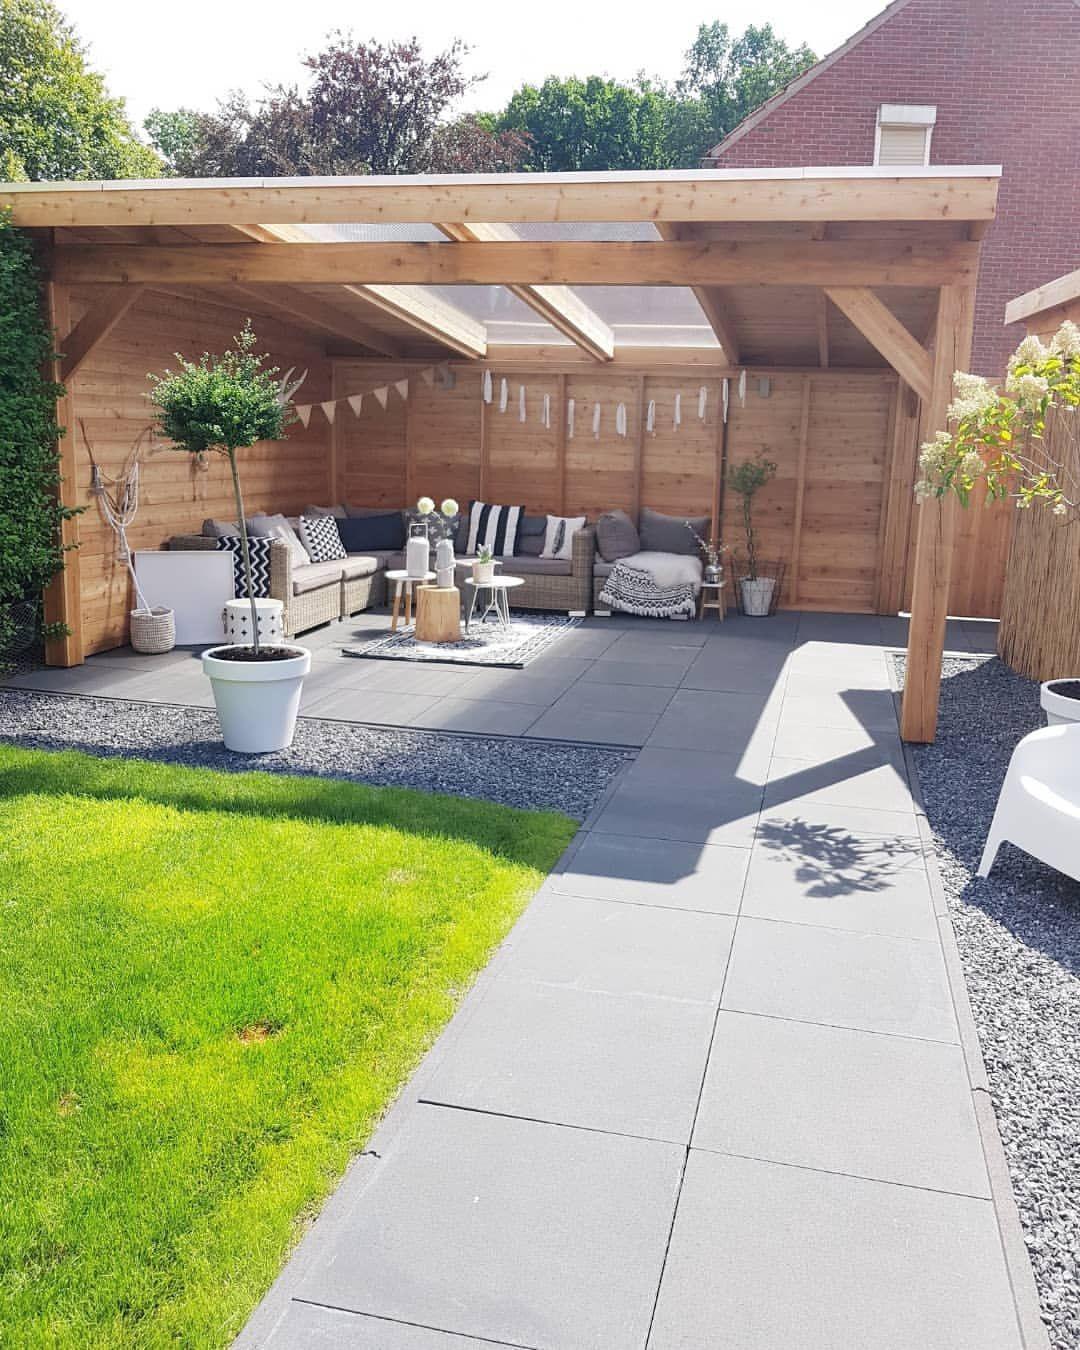 Pin By Juste Cmonnom On Abri Exterieur Backyard Landscaping Designs Backyard Patio Designs Small Backyard Landscaping